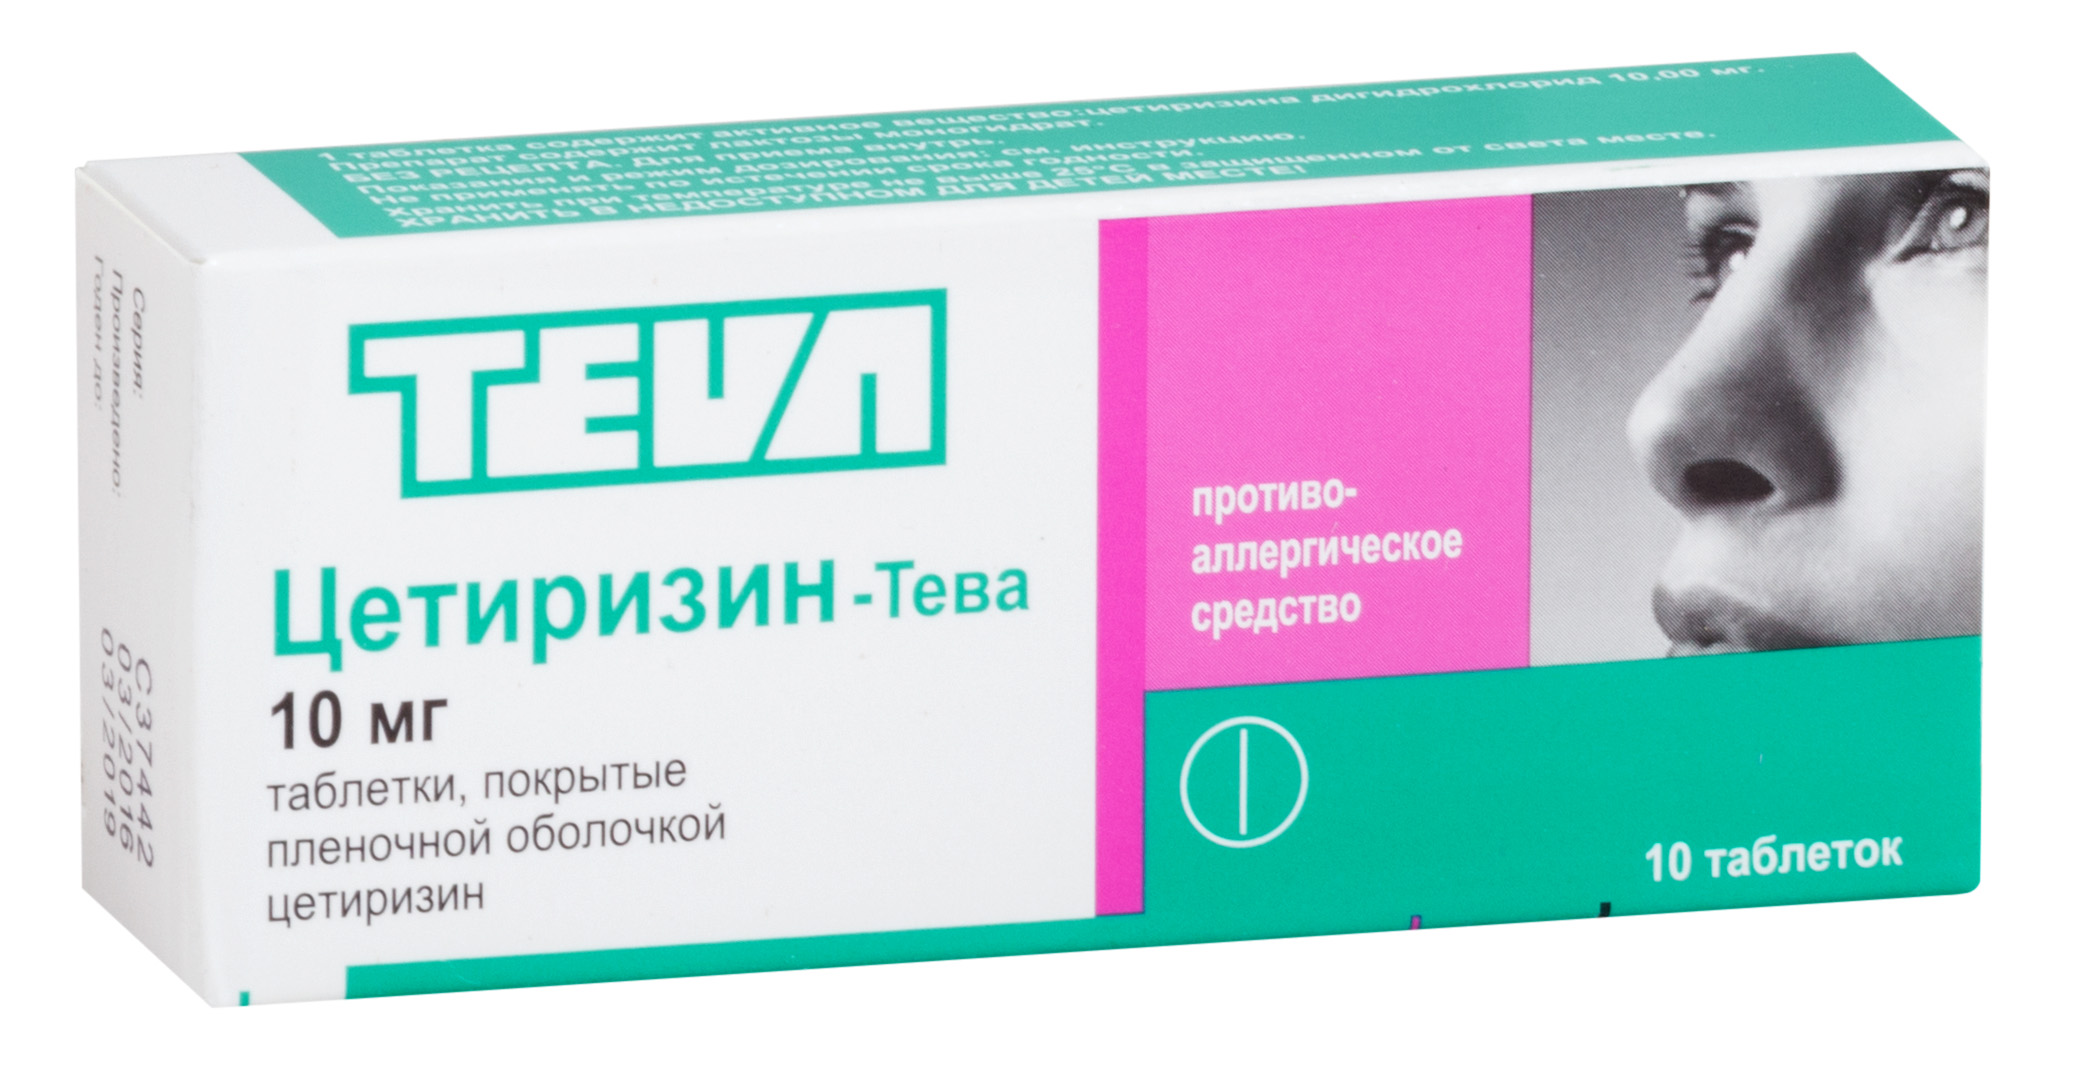 Цетиризин-тева таб. п.п.о. 10мг n10